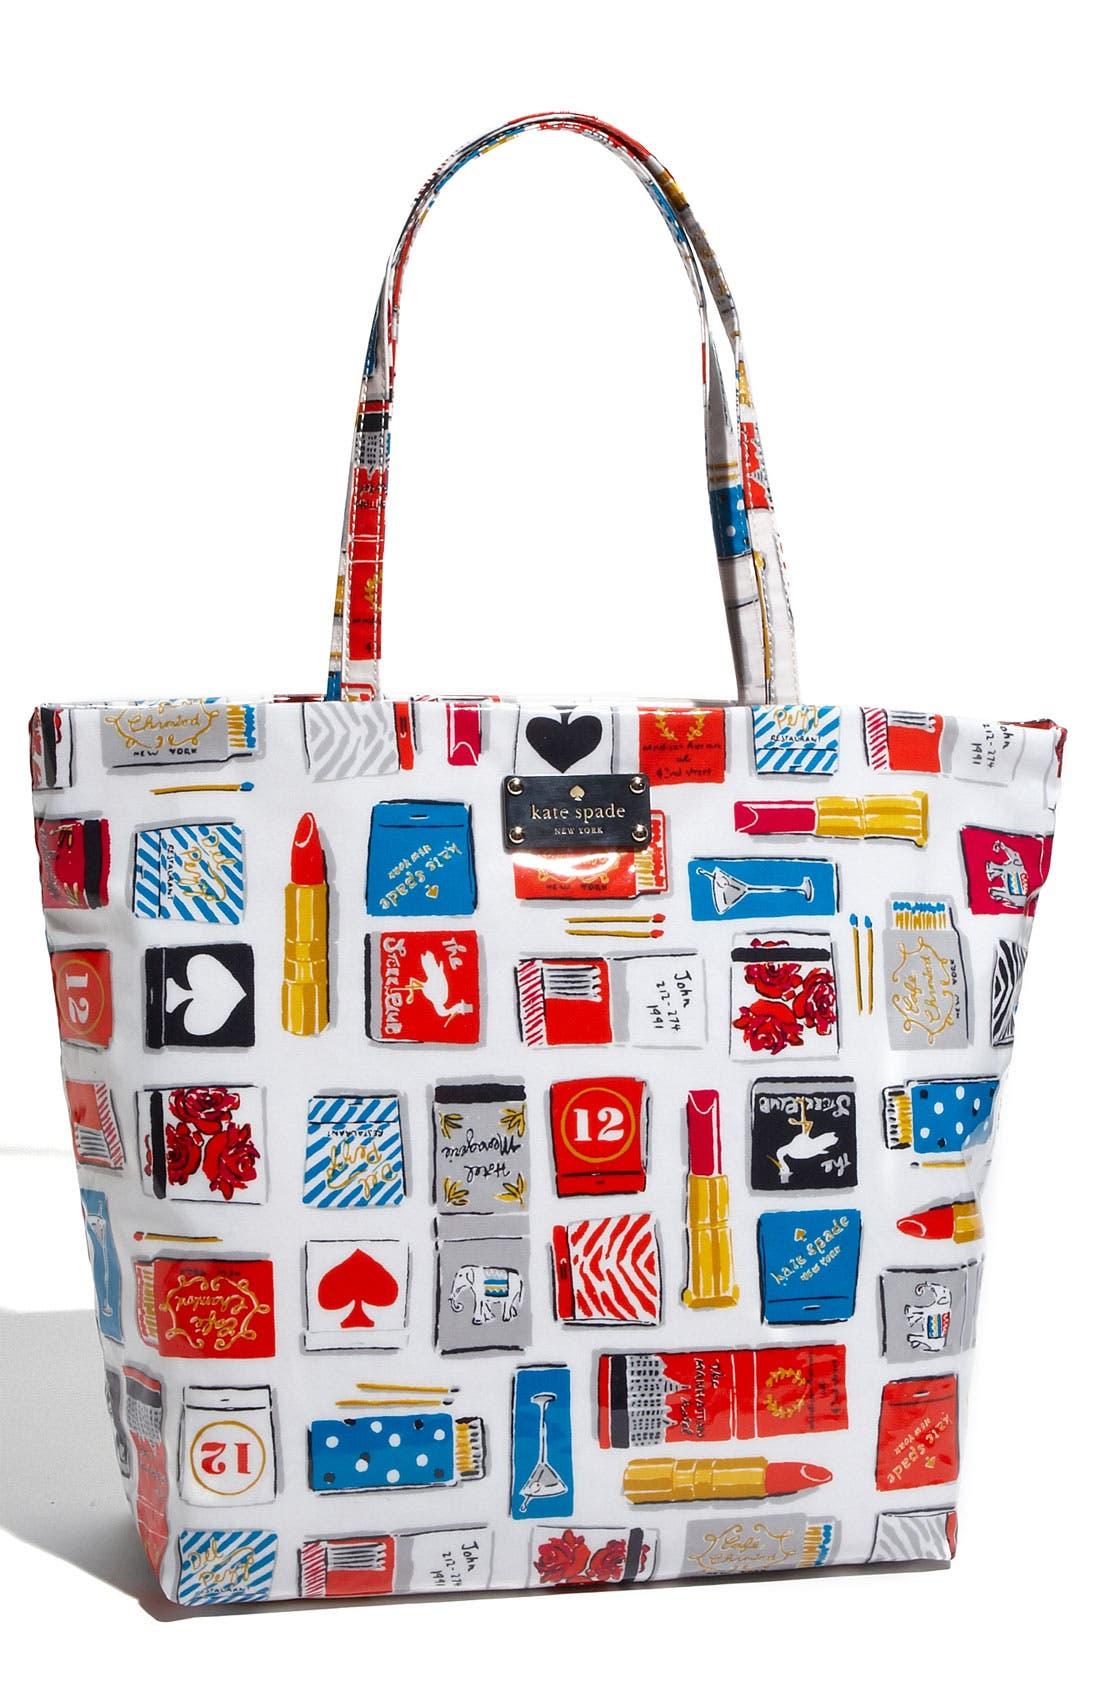 Main Image - kate spade new york 'daycation matchbook' coated canvas bon shopper